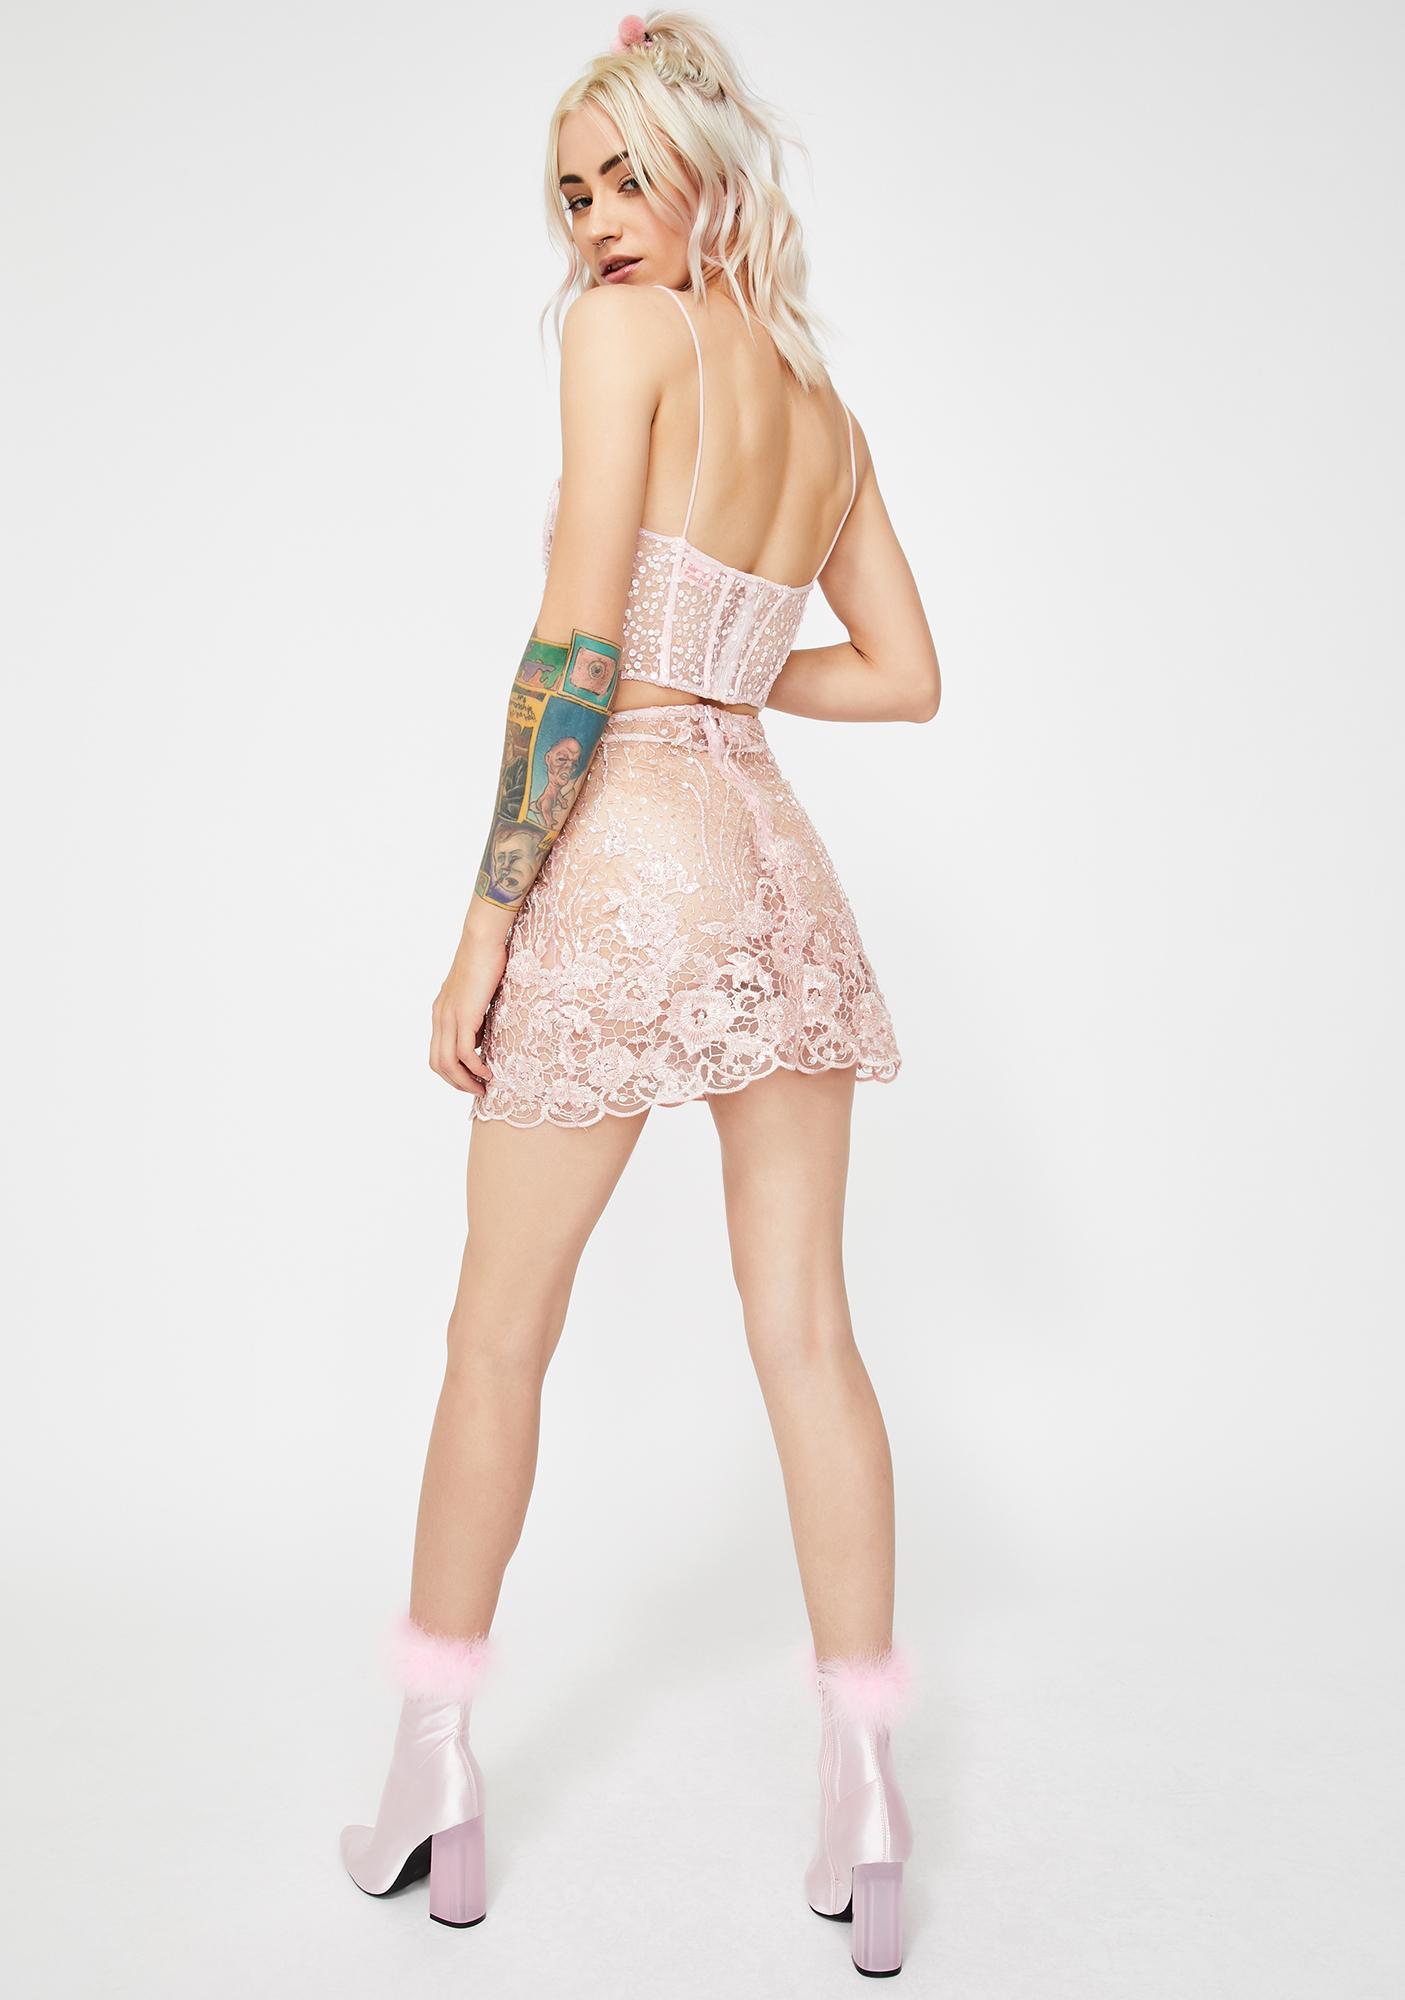 Dyspnea Devilish Beaded Skirt